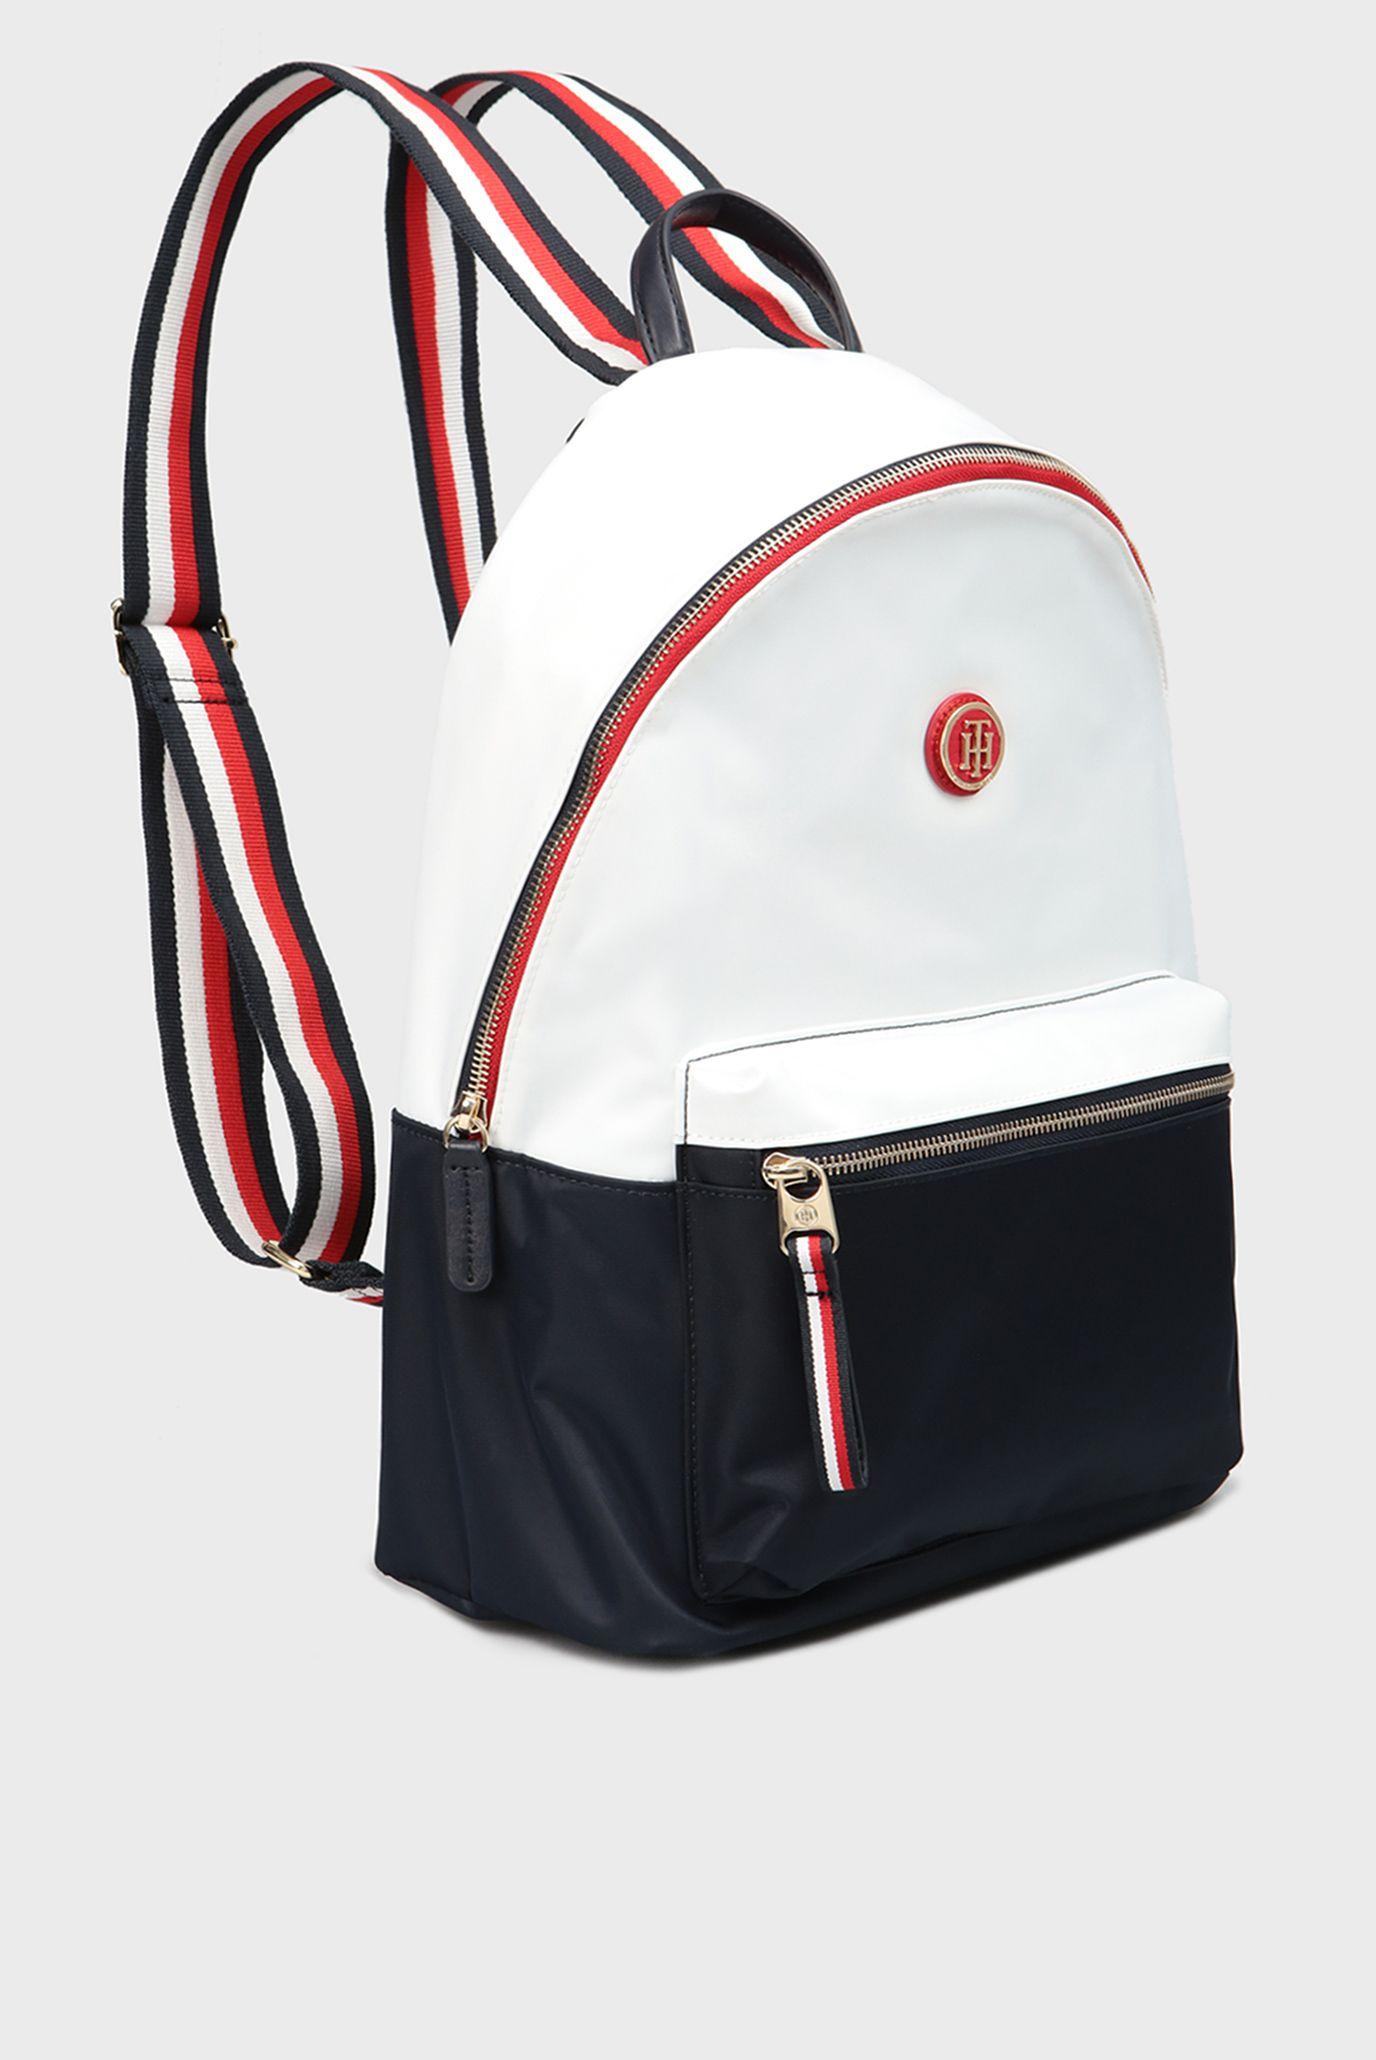 Купить Женский белый рюкзак Tommy Hilfiger Tommy Hilfiger AW0AW05407 –  Киев 768f48d10662f